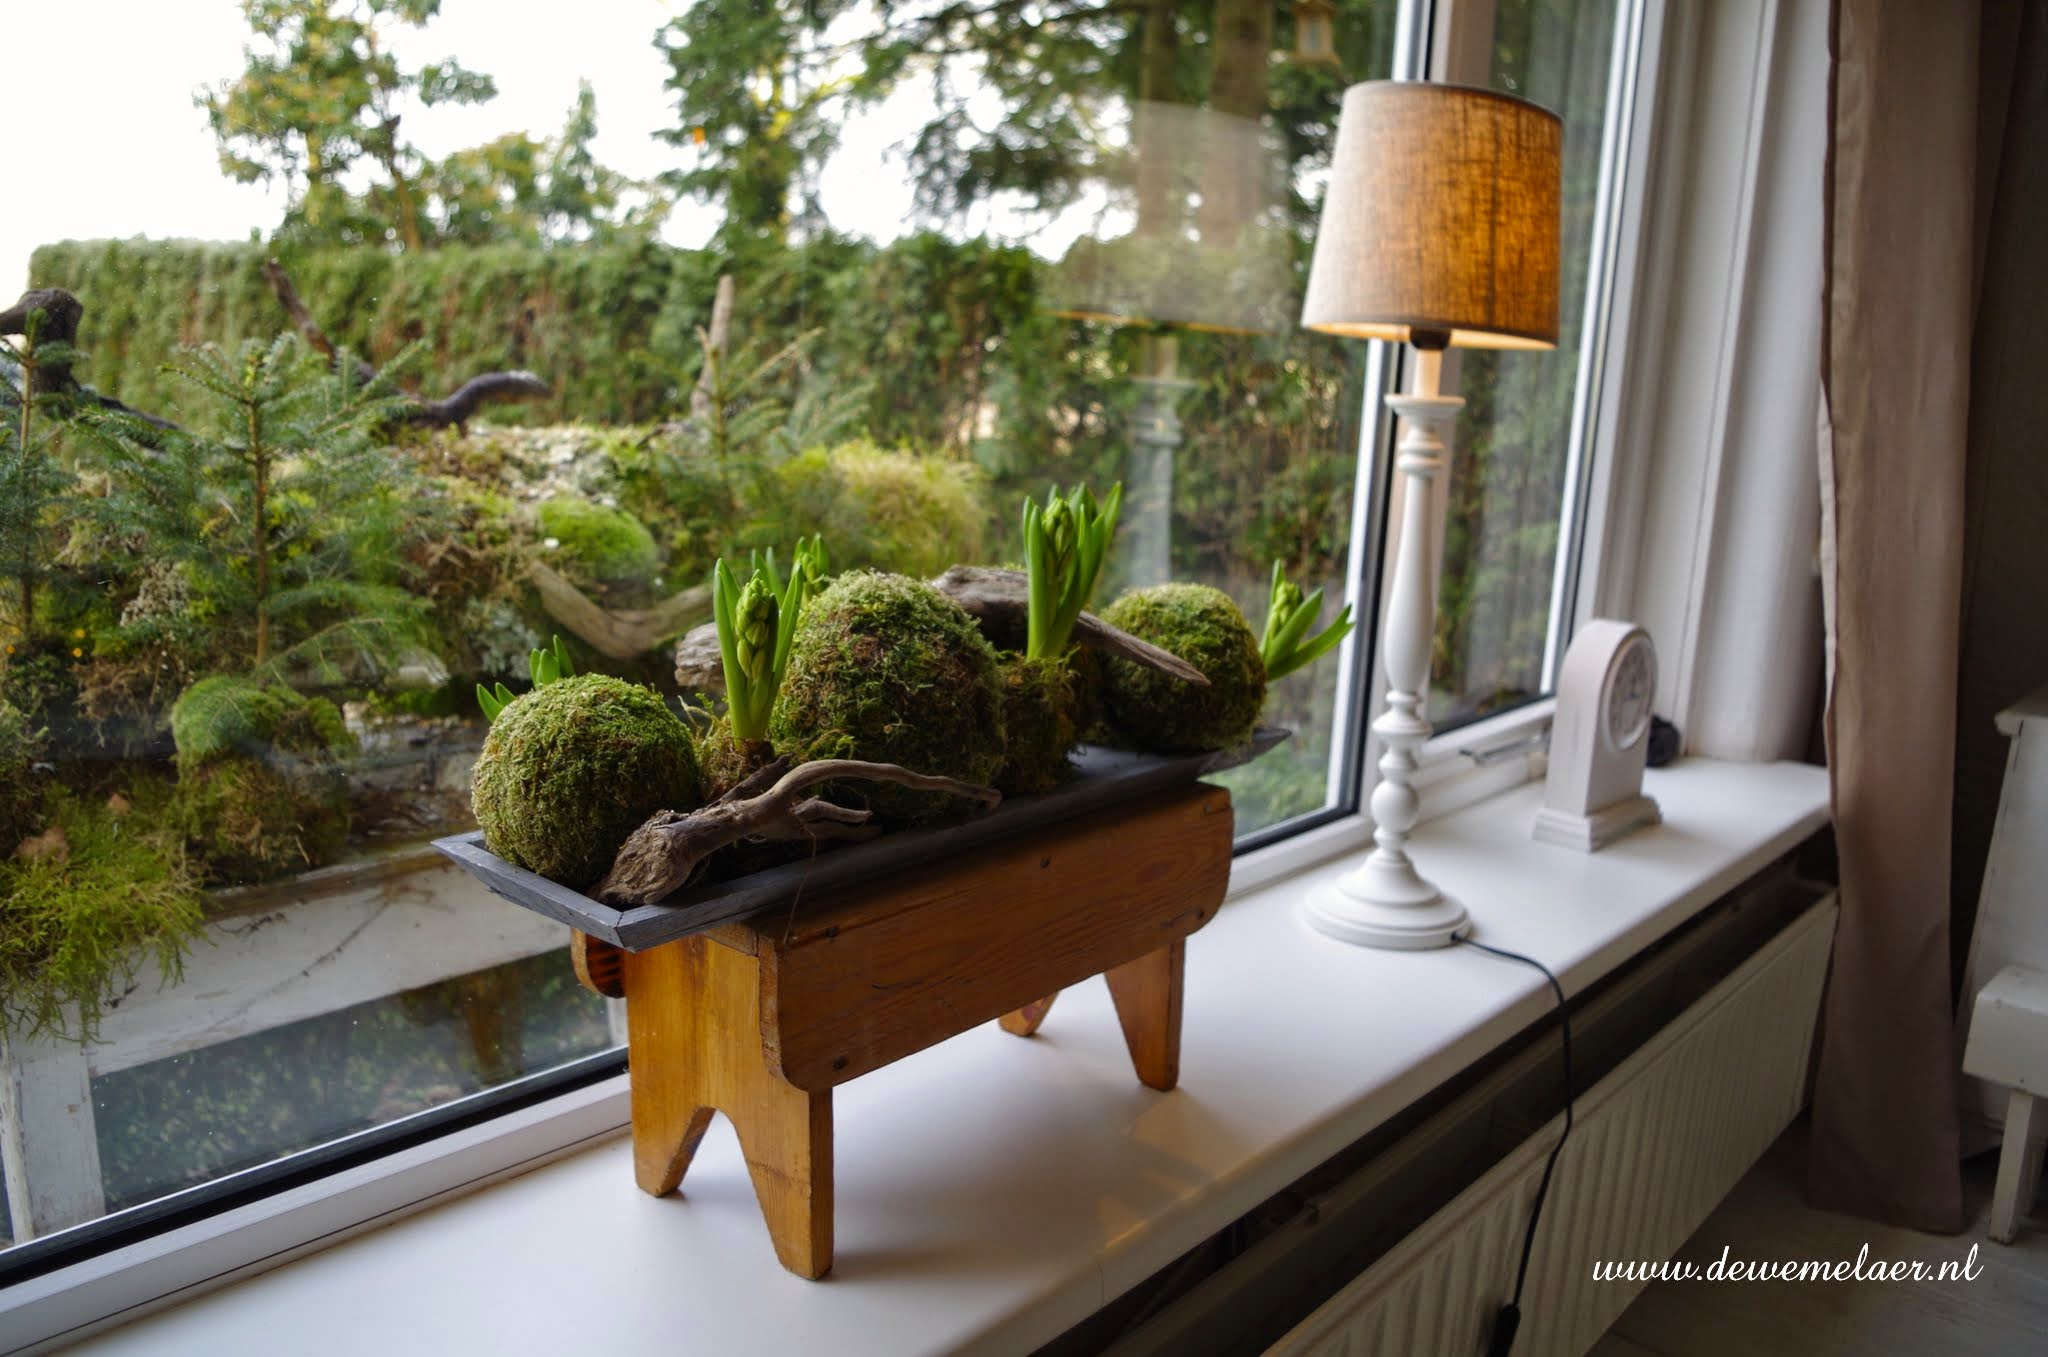 Binnenkijken bij Johanna | wonen in Noorse stijl